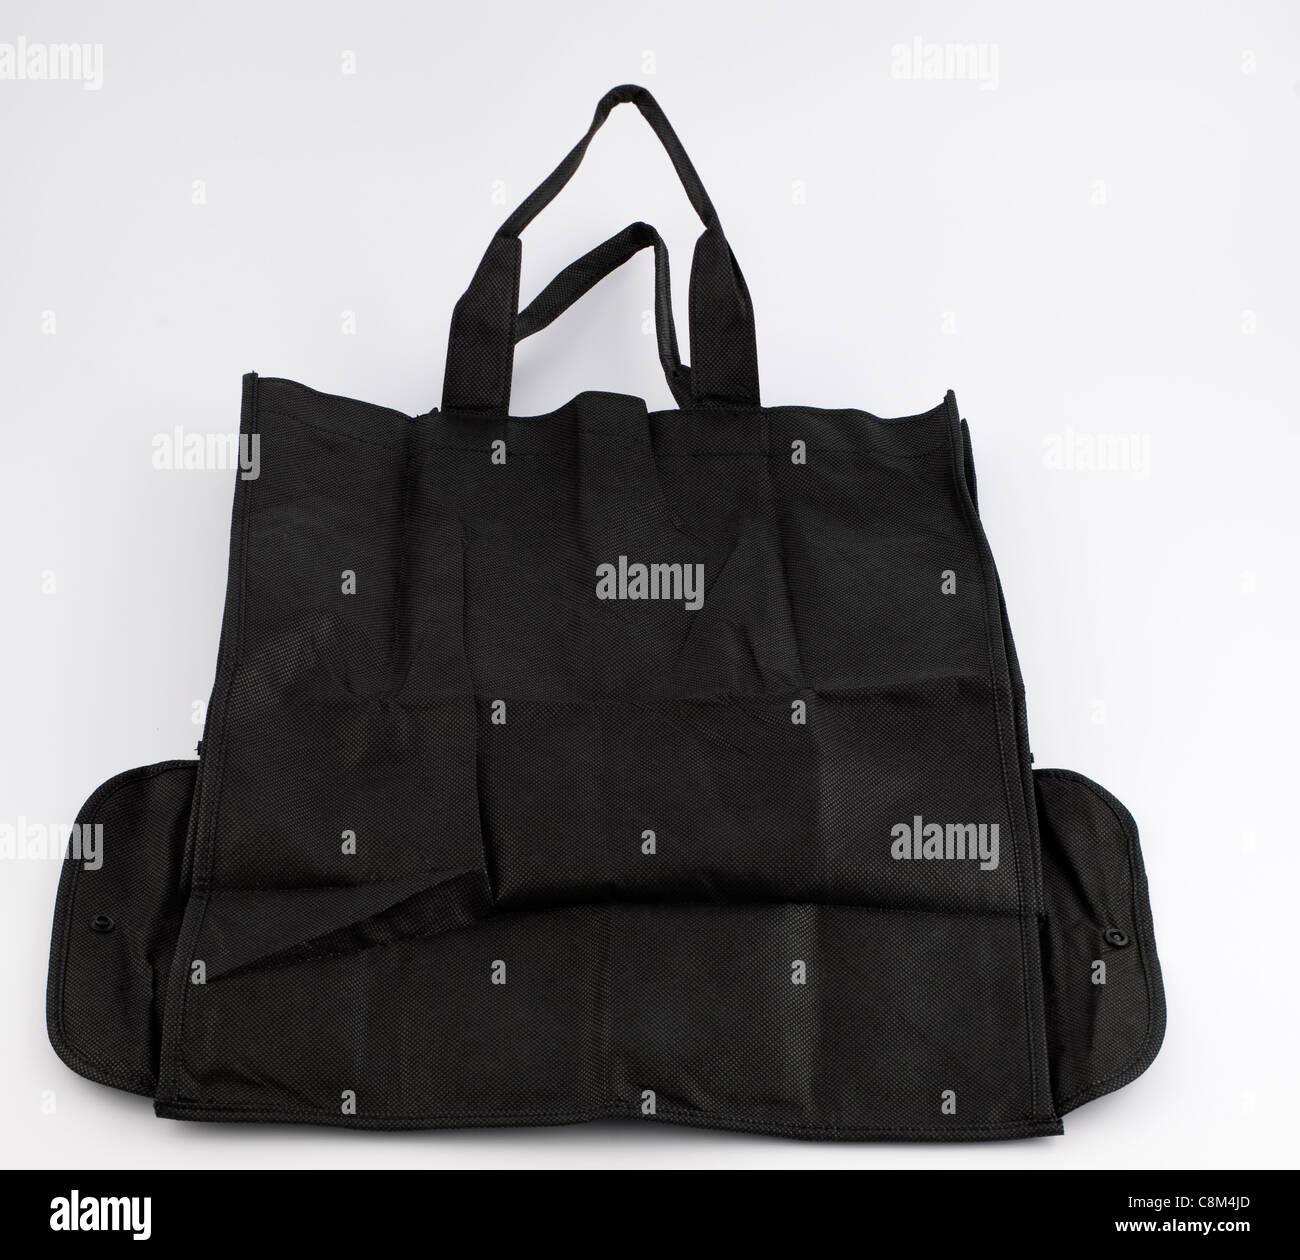 Black reusable press stud fold away handy bag - Stock Image